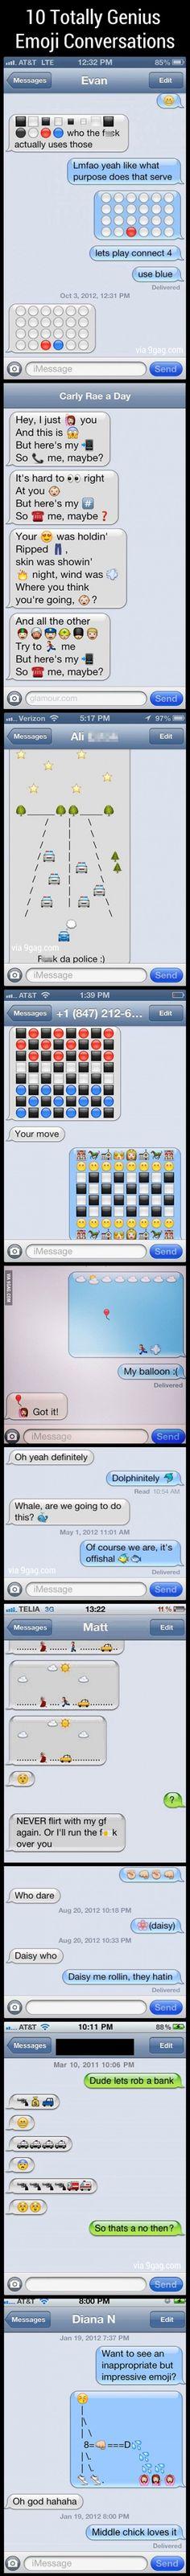 9GAG - 10 Totally Genius Emoji Conversations